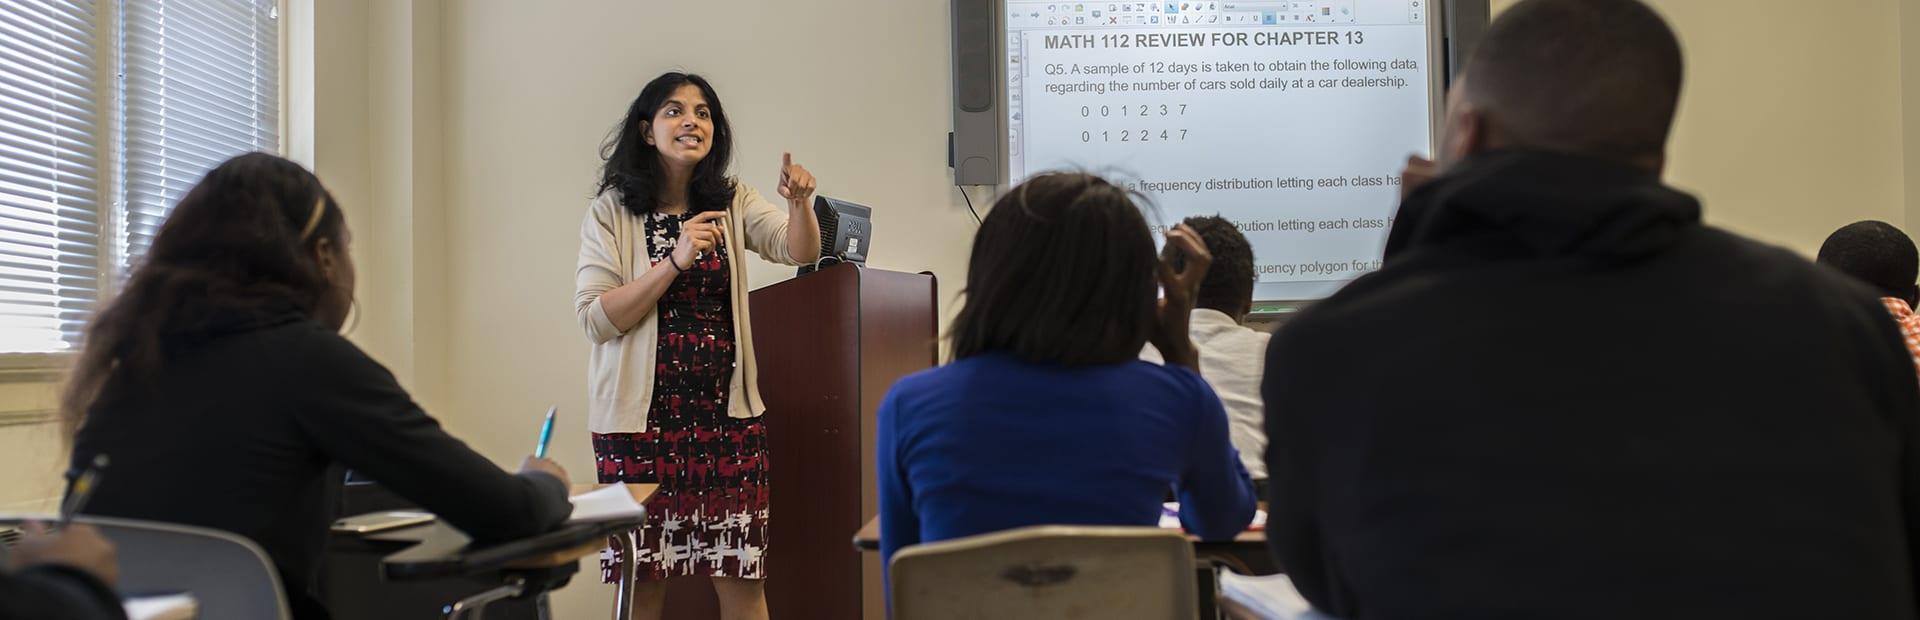 Teacher speaking in front of students in class